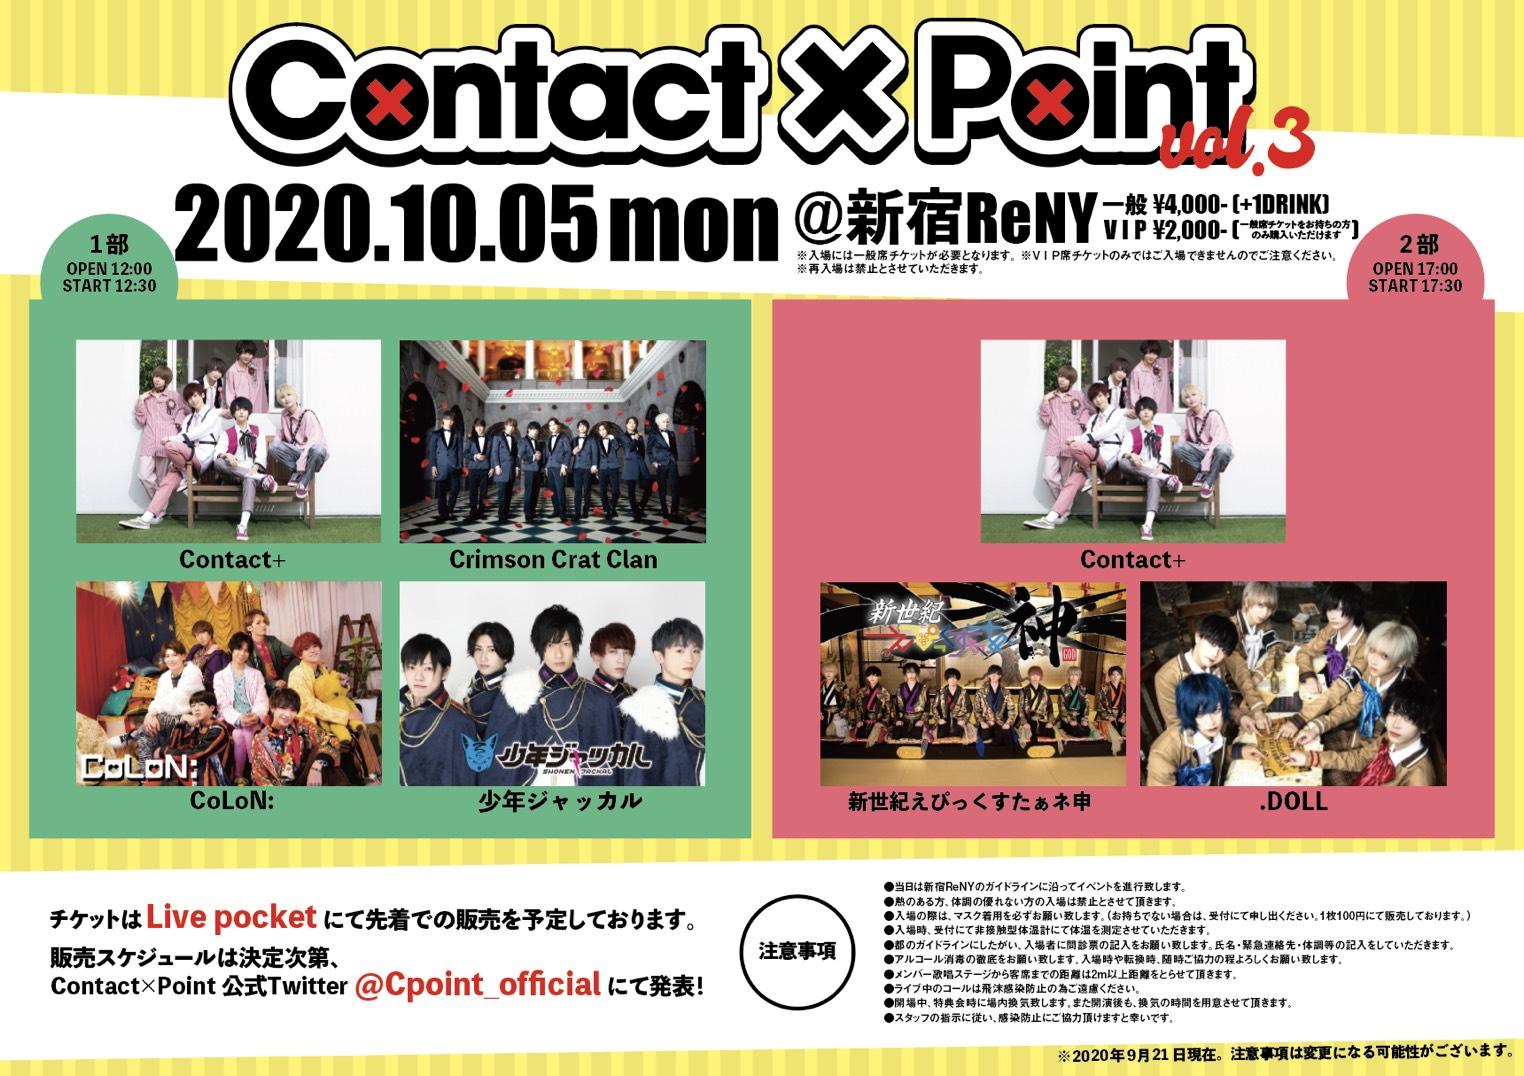 「Contact×Point Vol.3」一部【VIP席 CoLoN:】